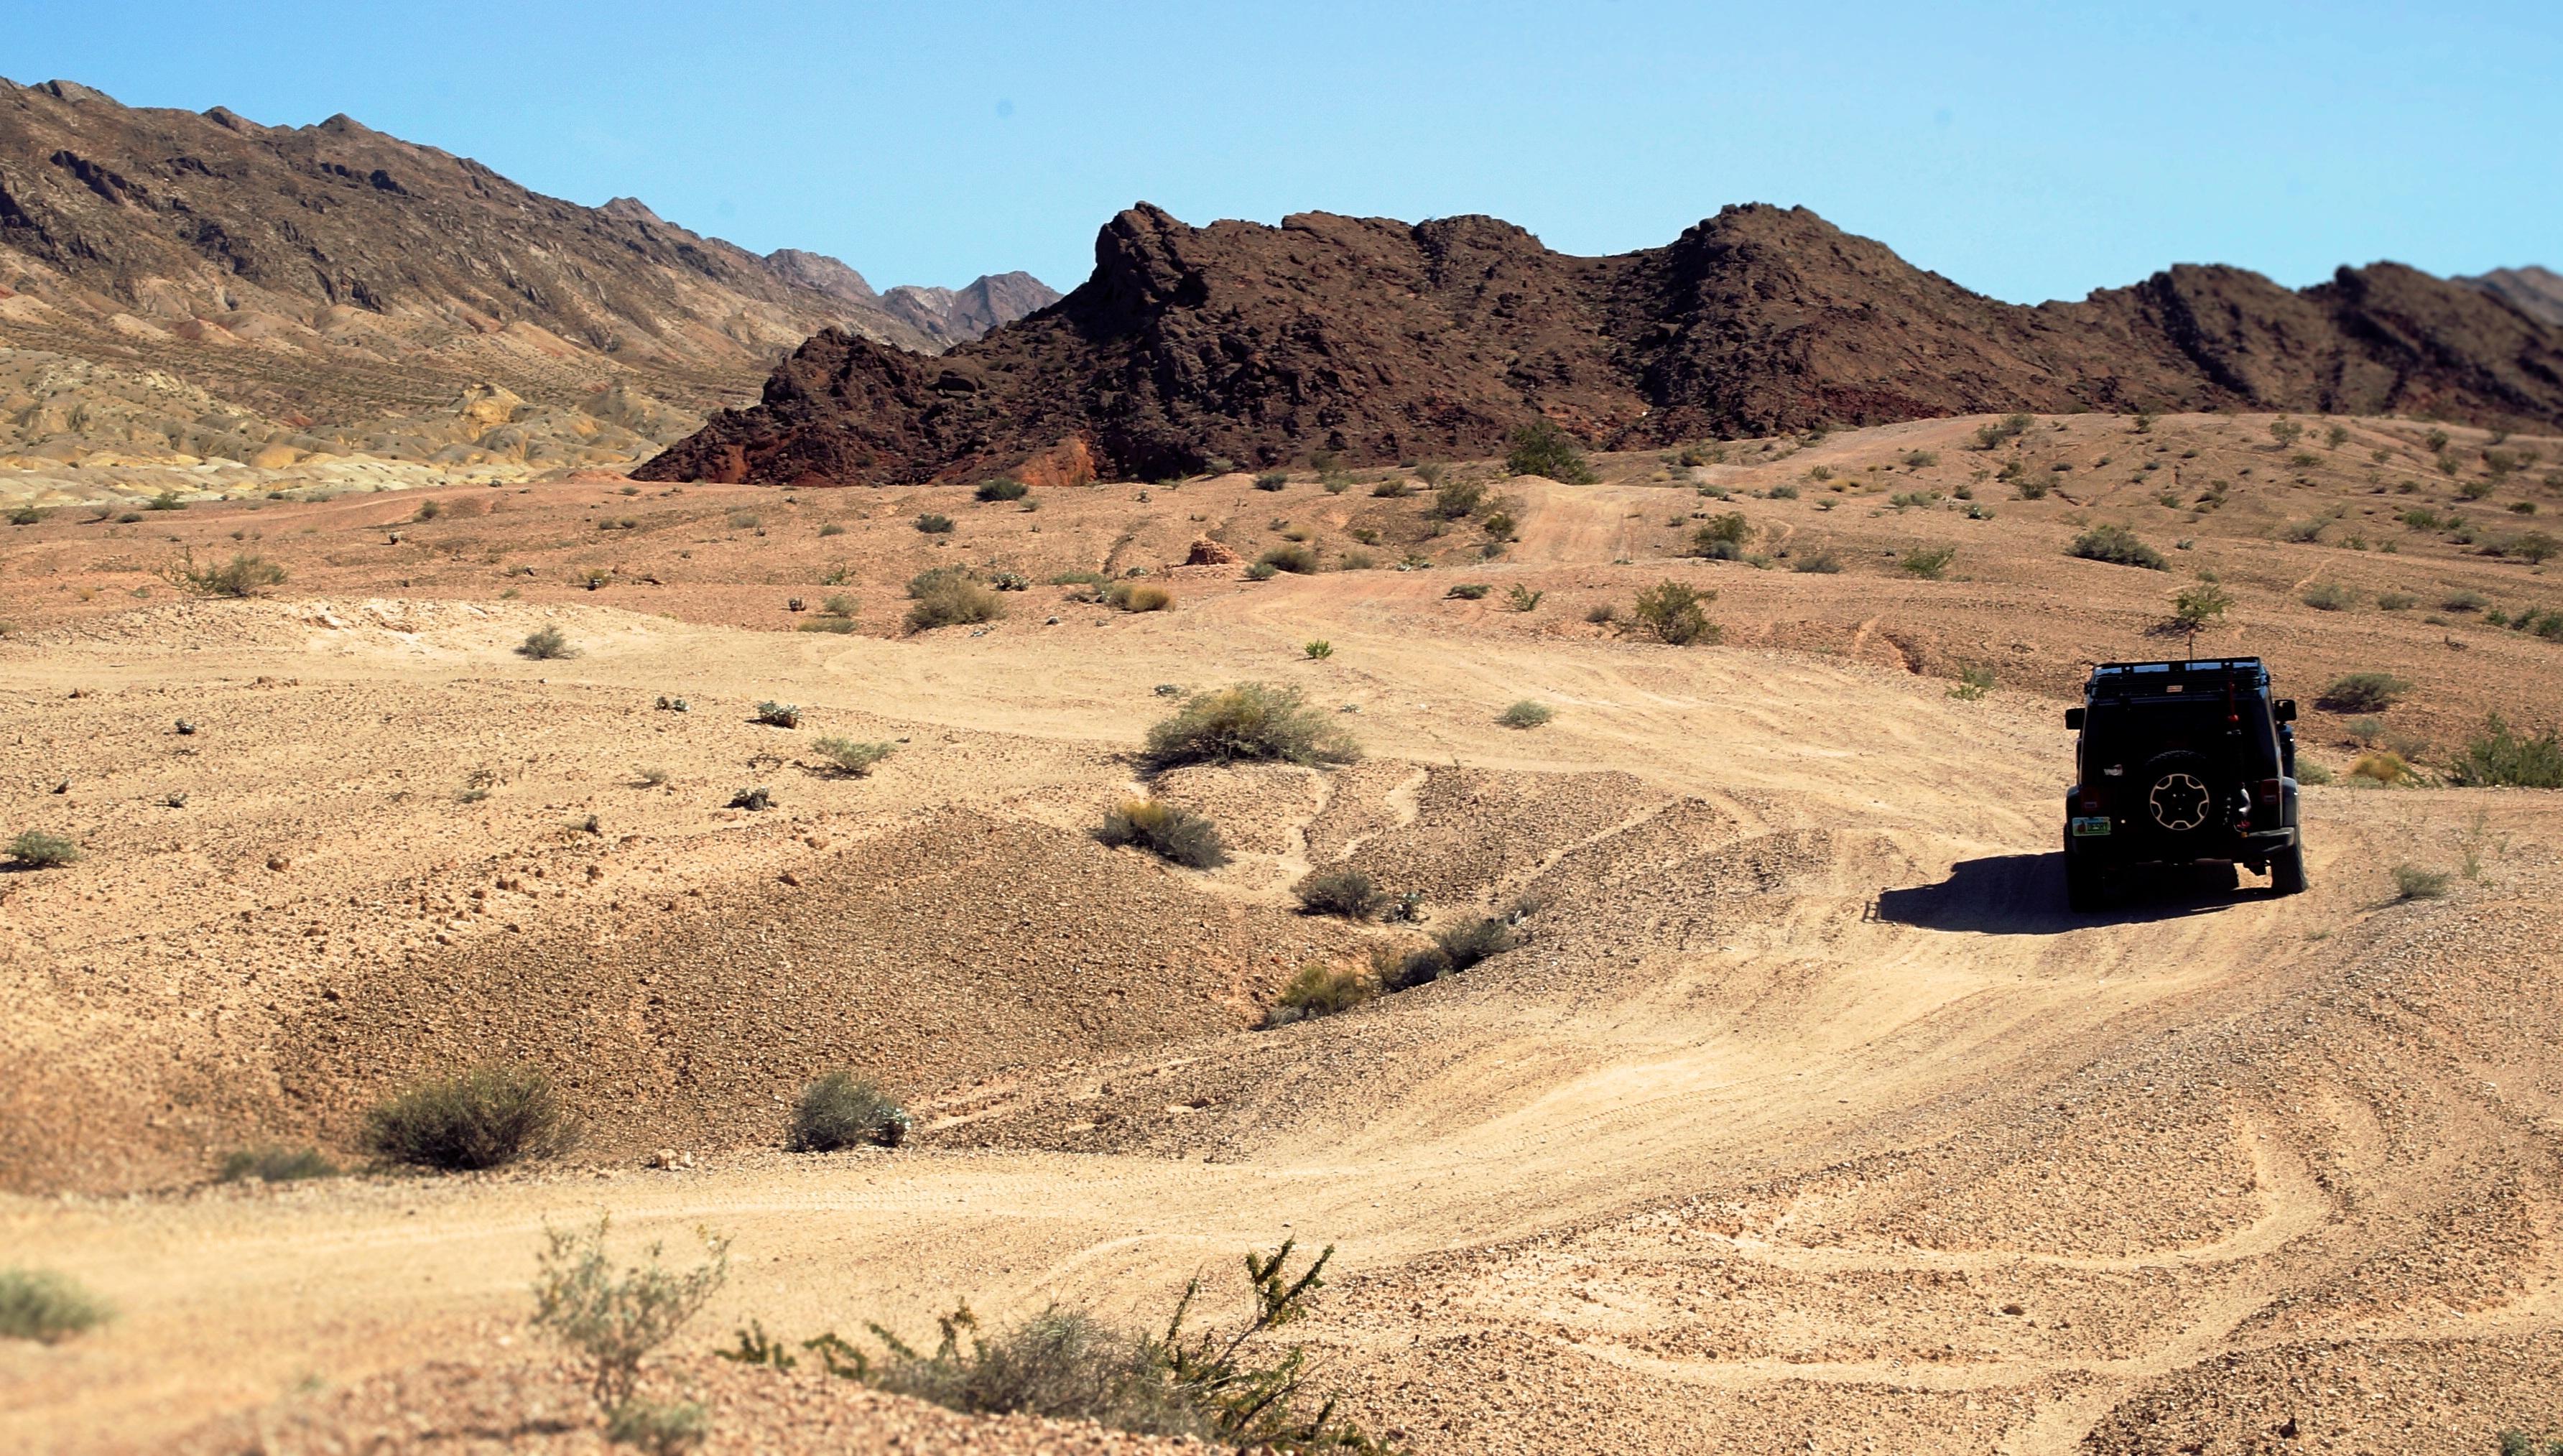 Ecosistema Desierto